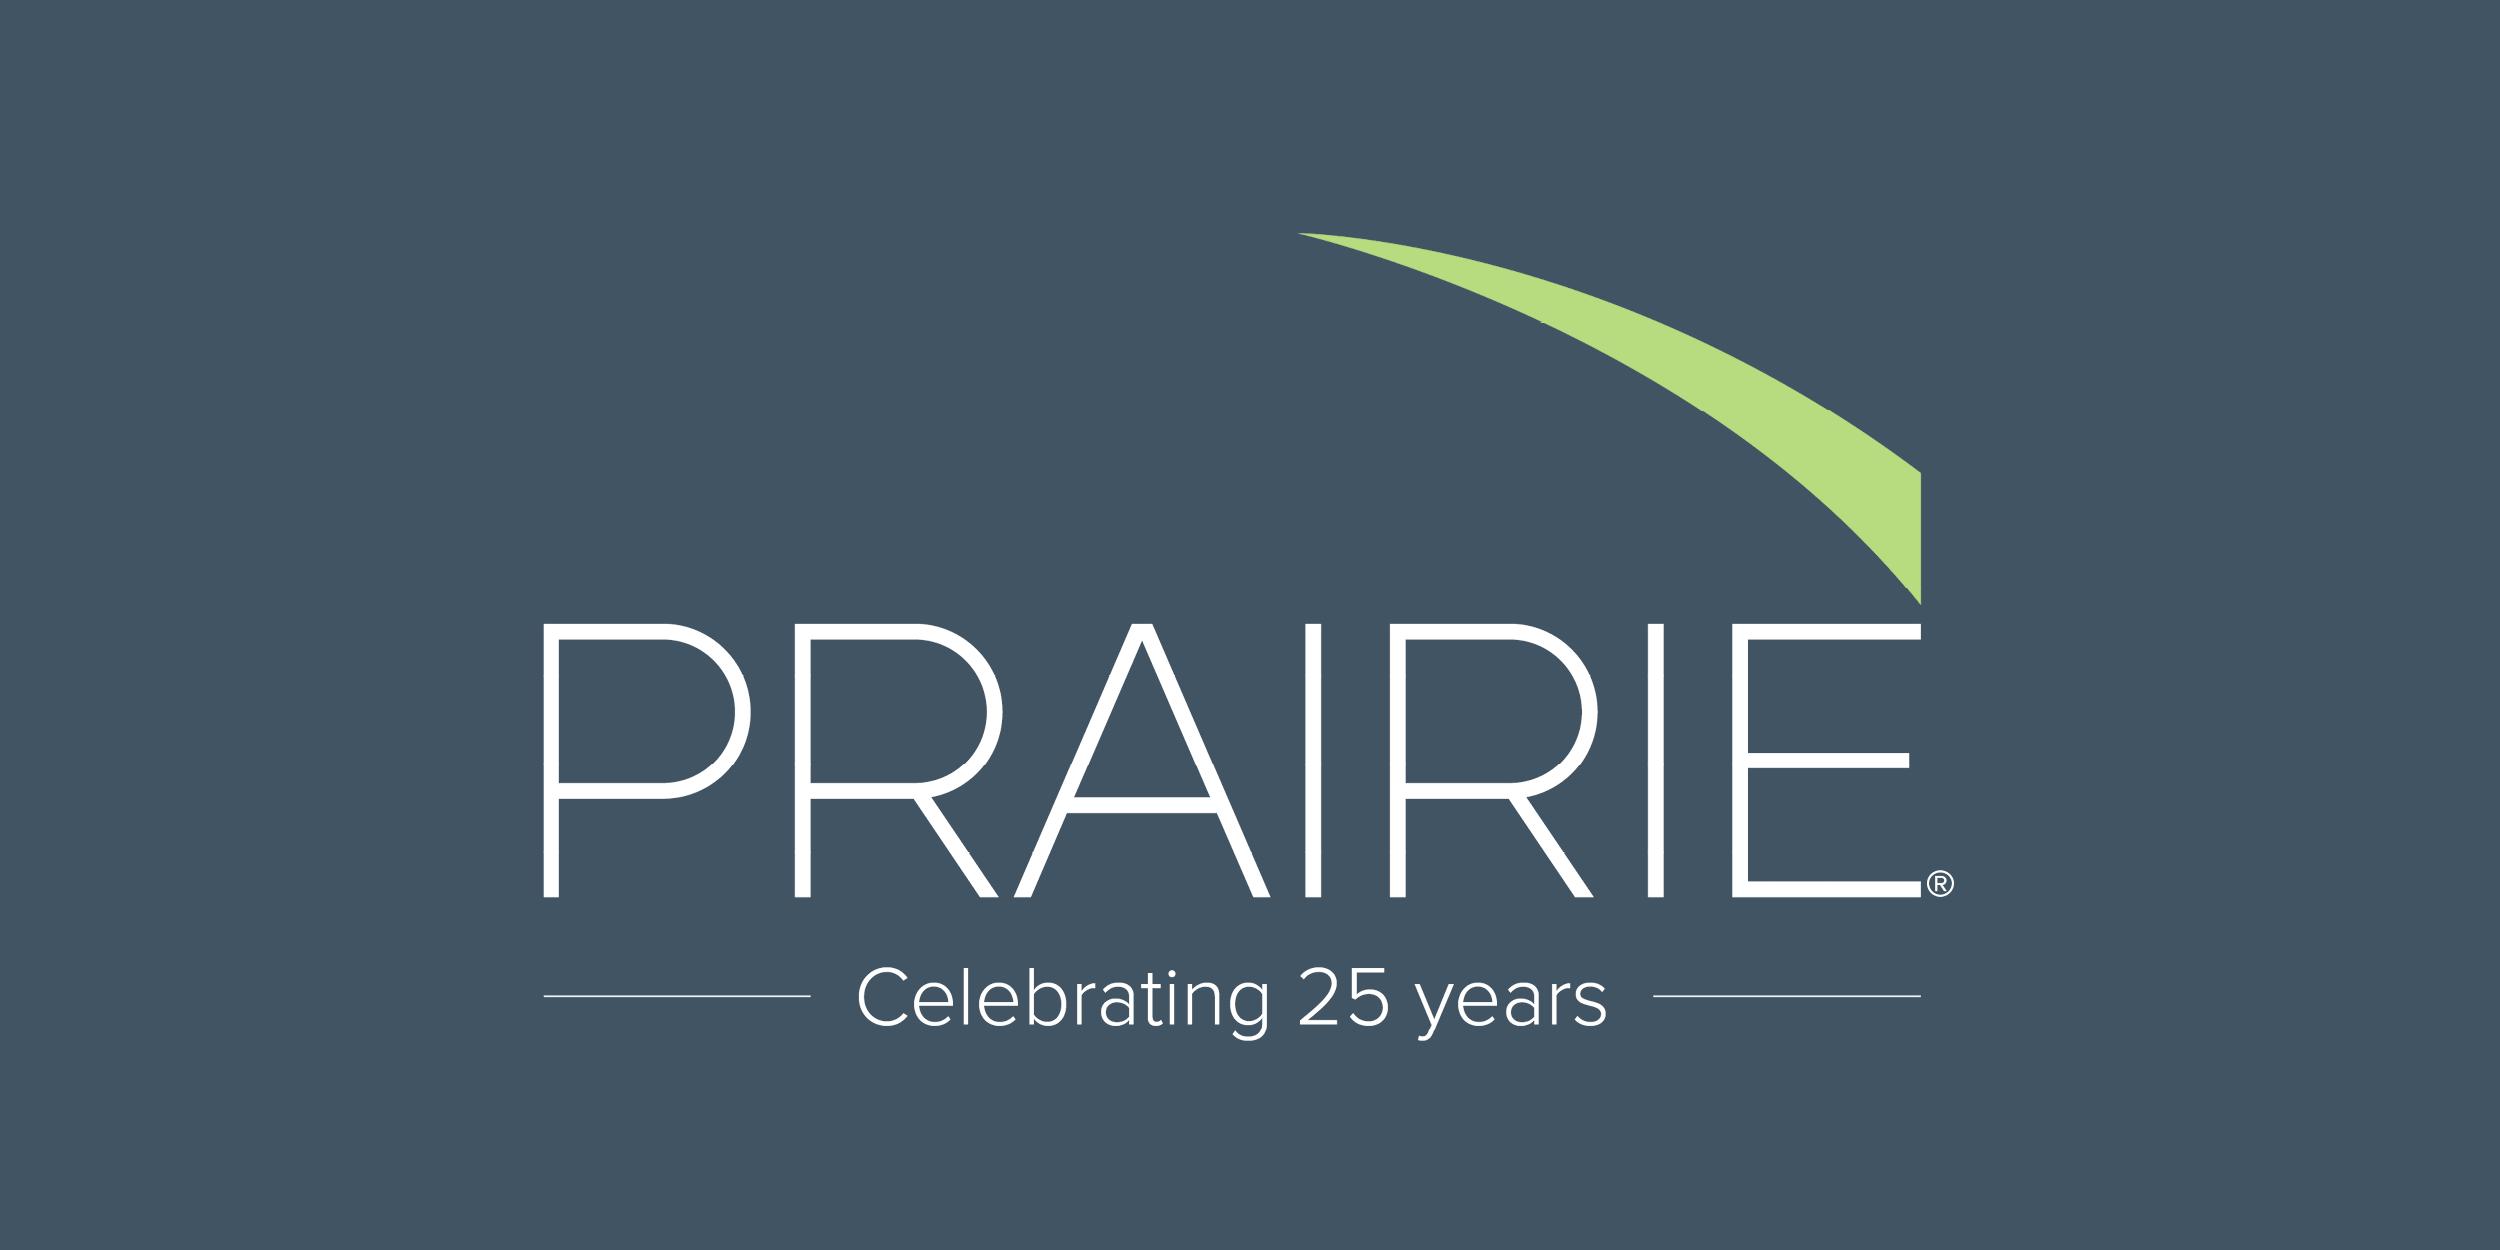 Prairie Celebrates Its 25th Anniversary